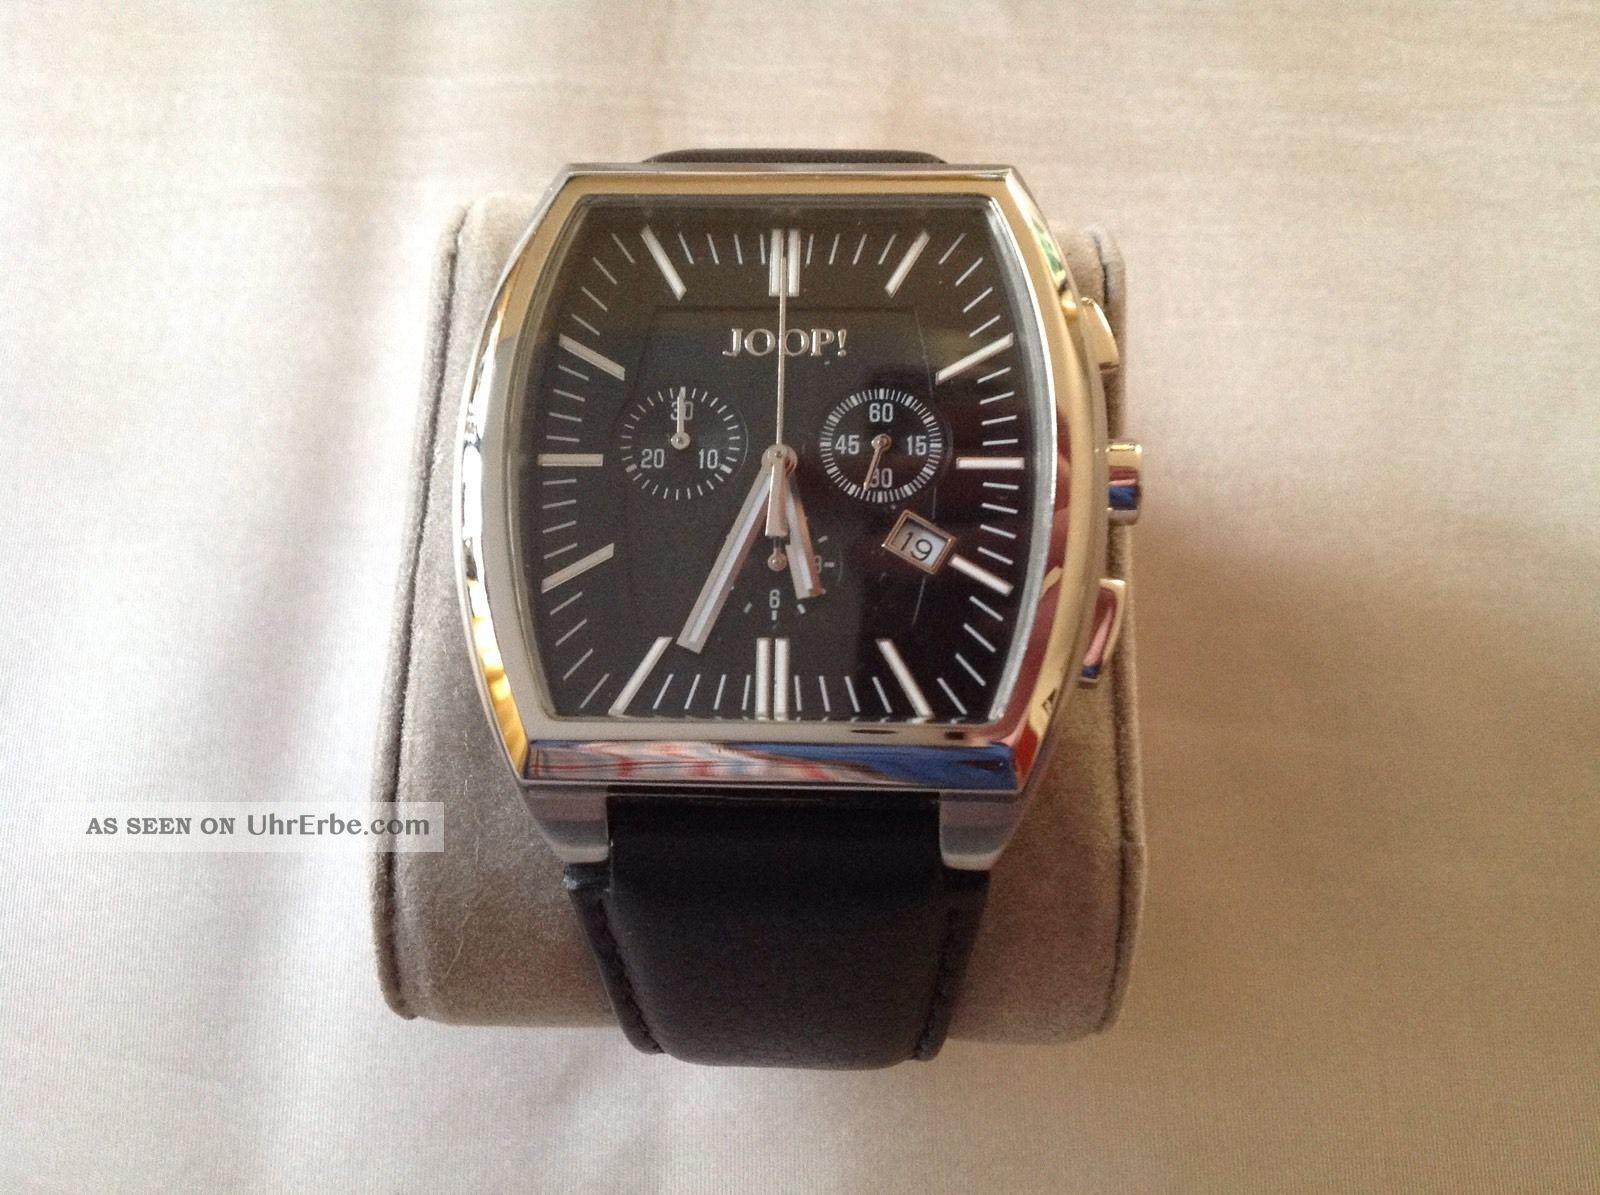 Joop Herrenchronograph - Schwarzes Zifferblatt - Lederarmband - Aus Uhrensammlung Armbanduhren Bild